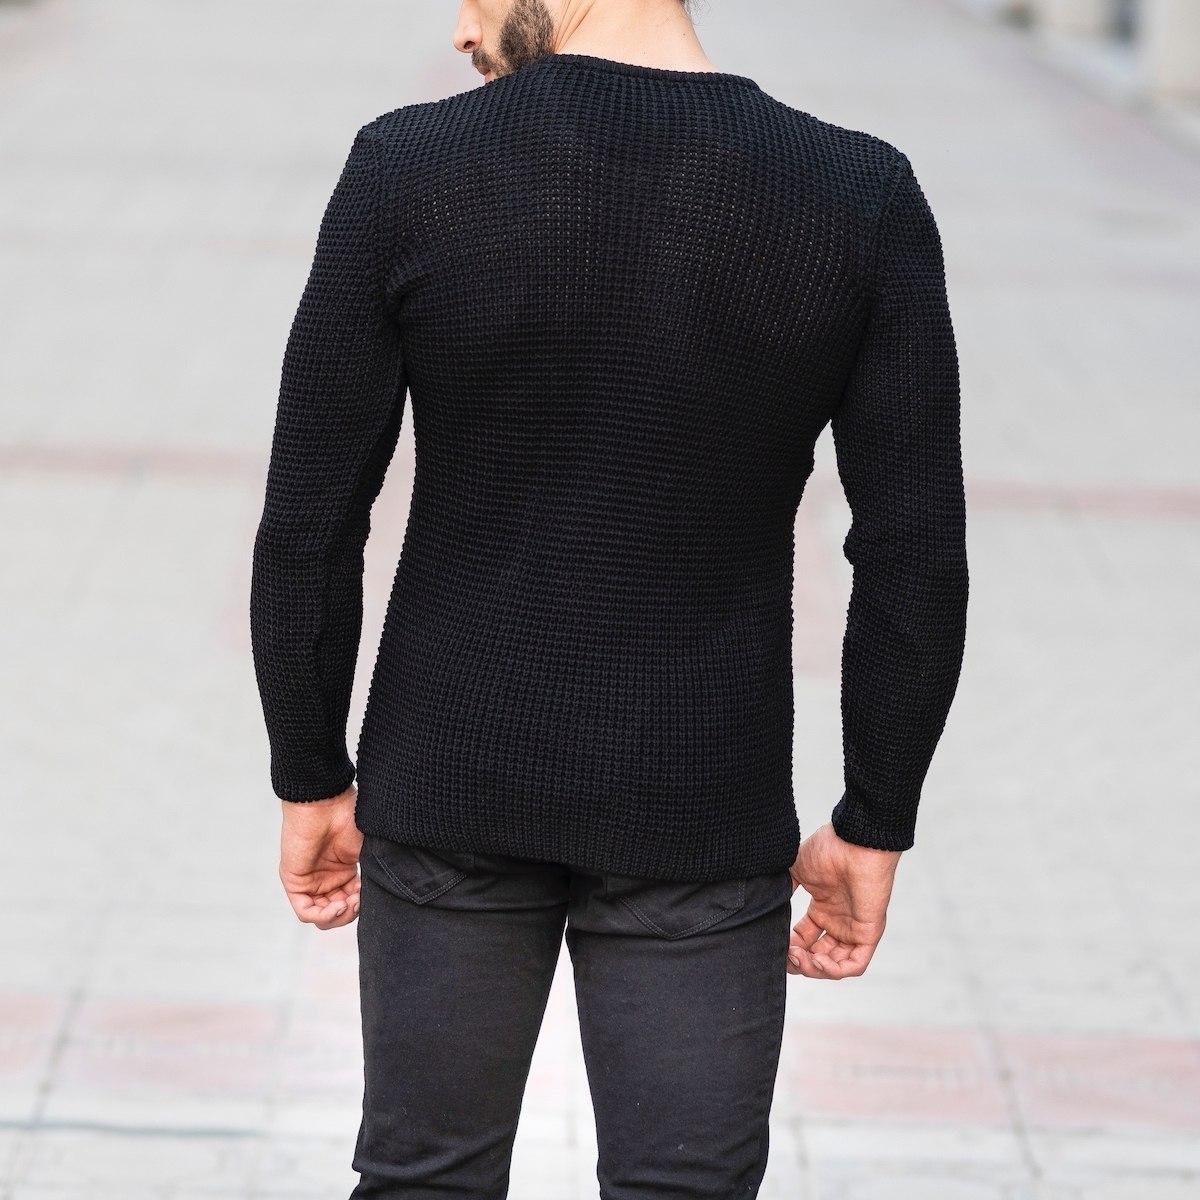 Knitted Pullover In Black Mv Premium Brand - 4